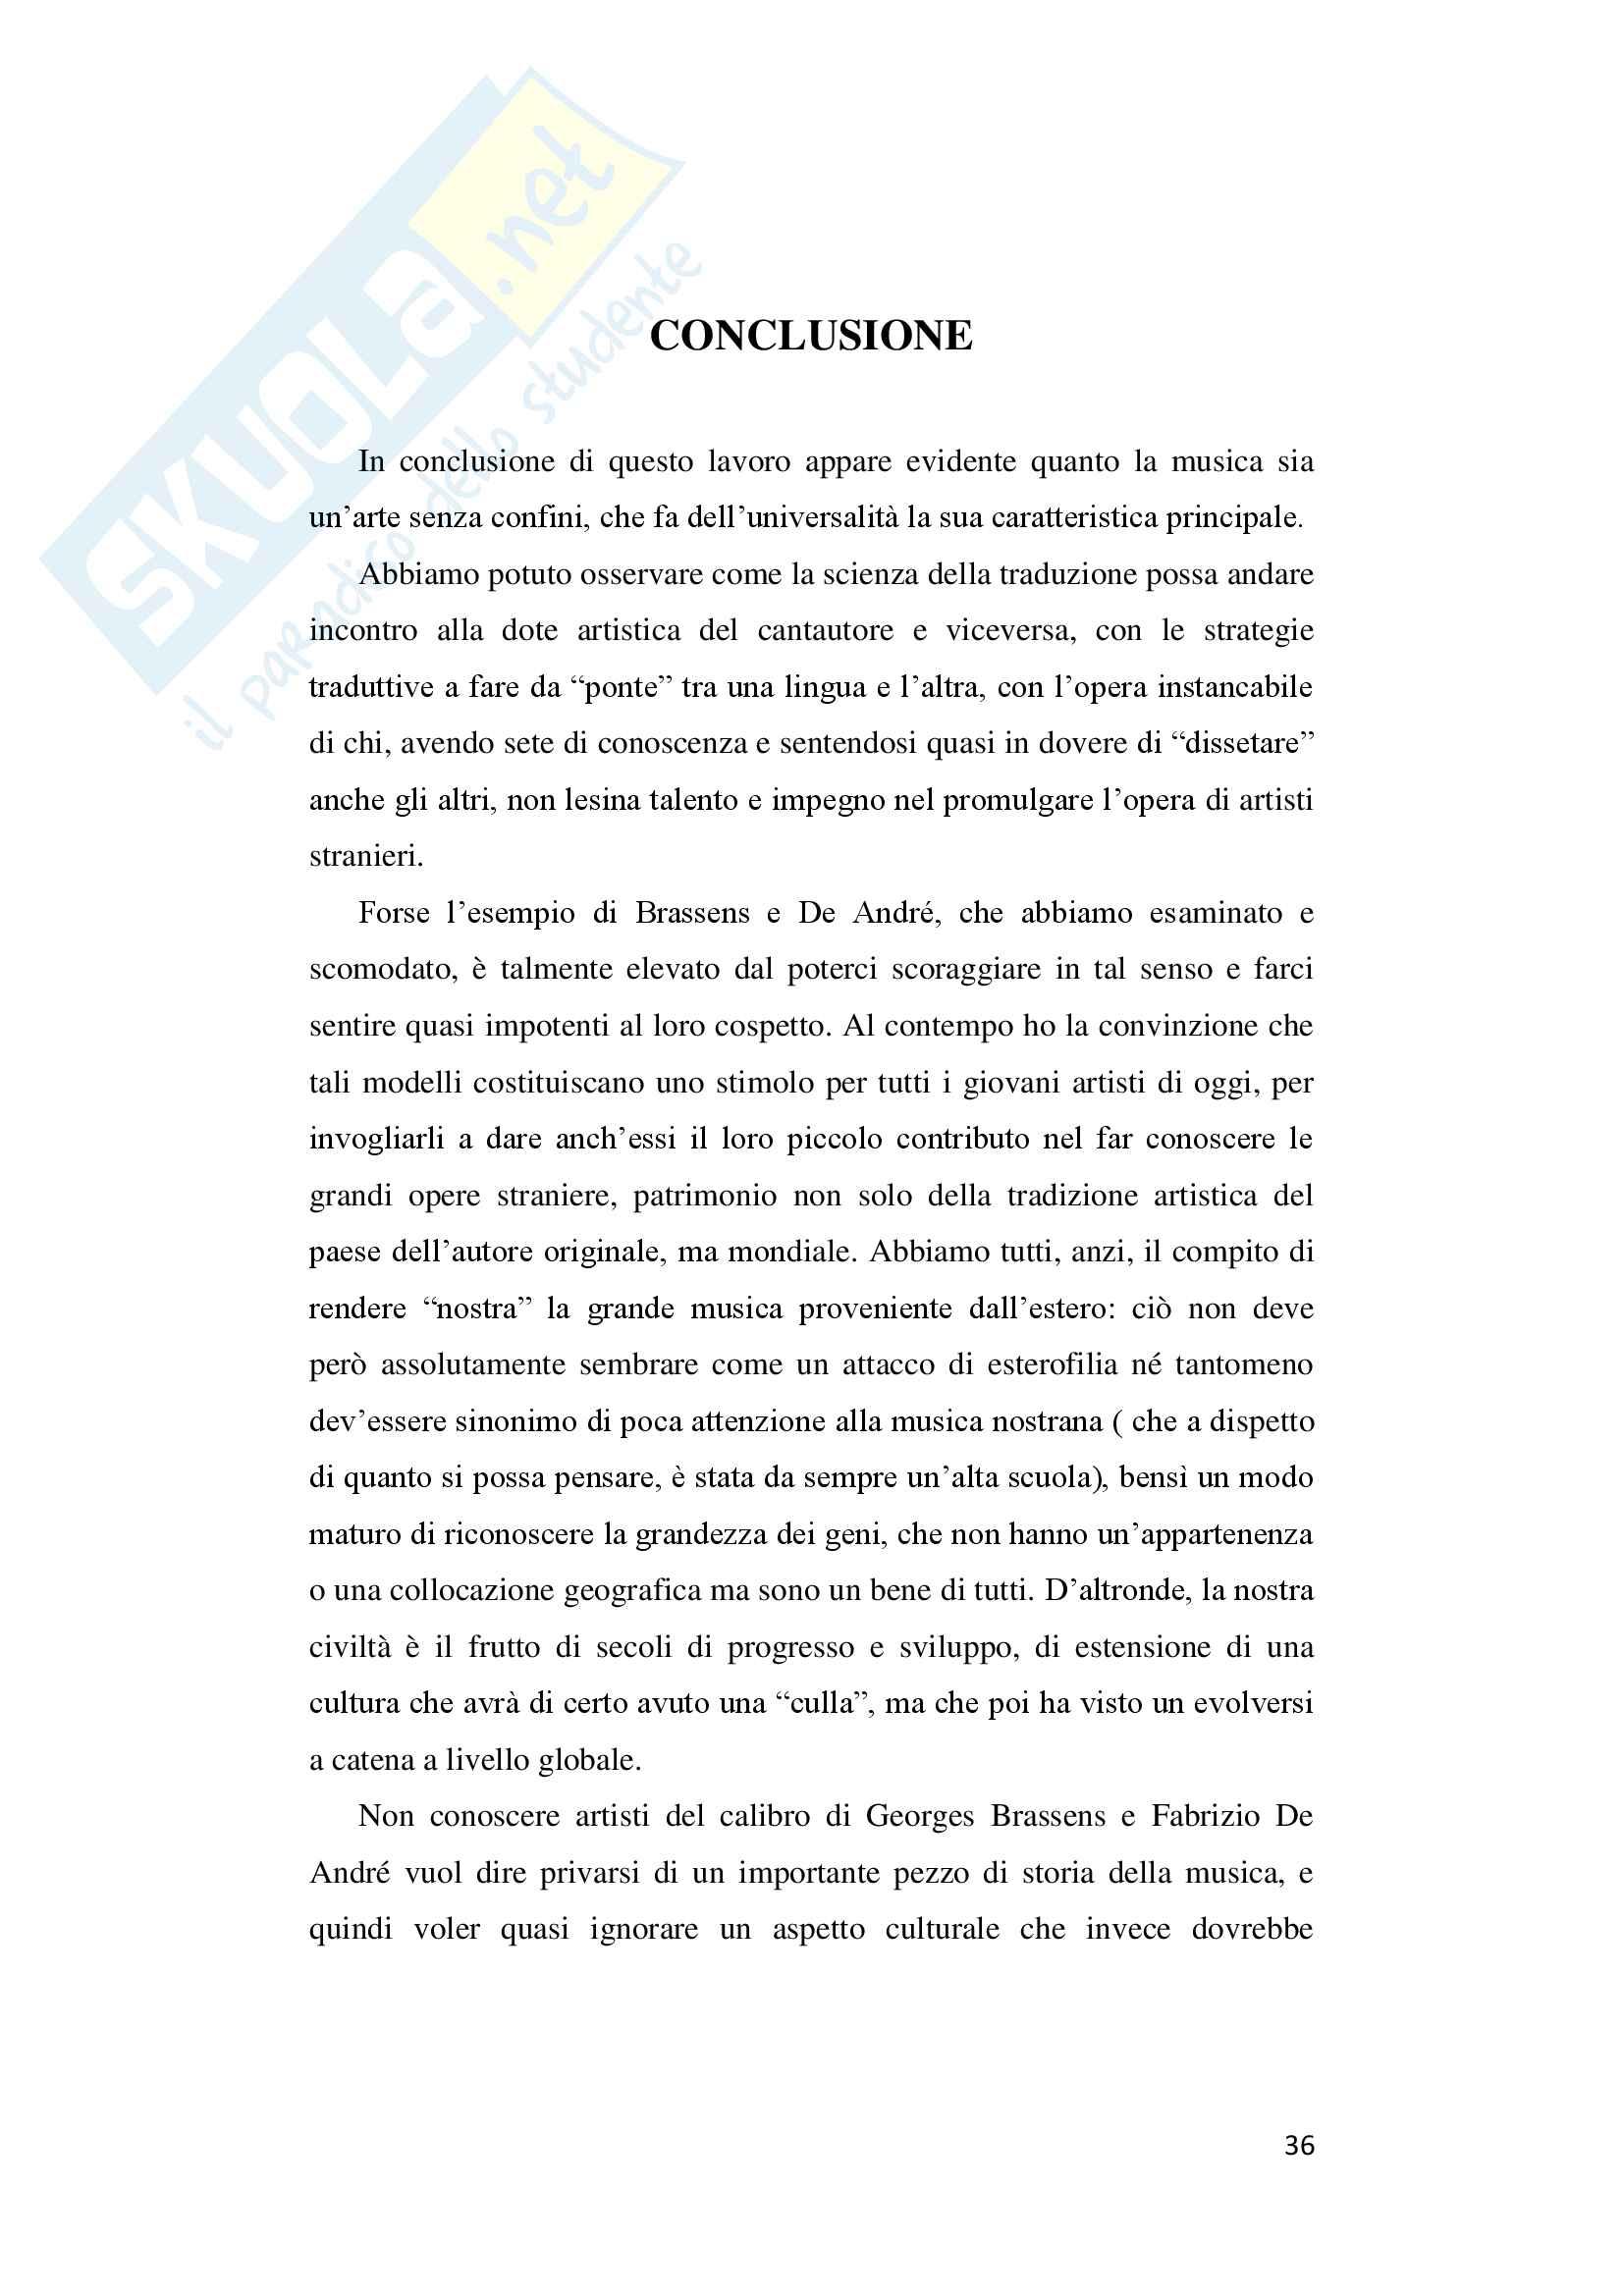 "Tesi di laurea in lingua e traduzione lingua francese - ""De André traduce Brassens"" Pag. 36"